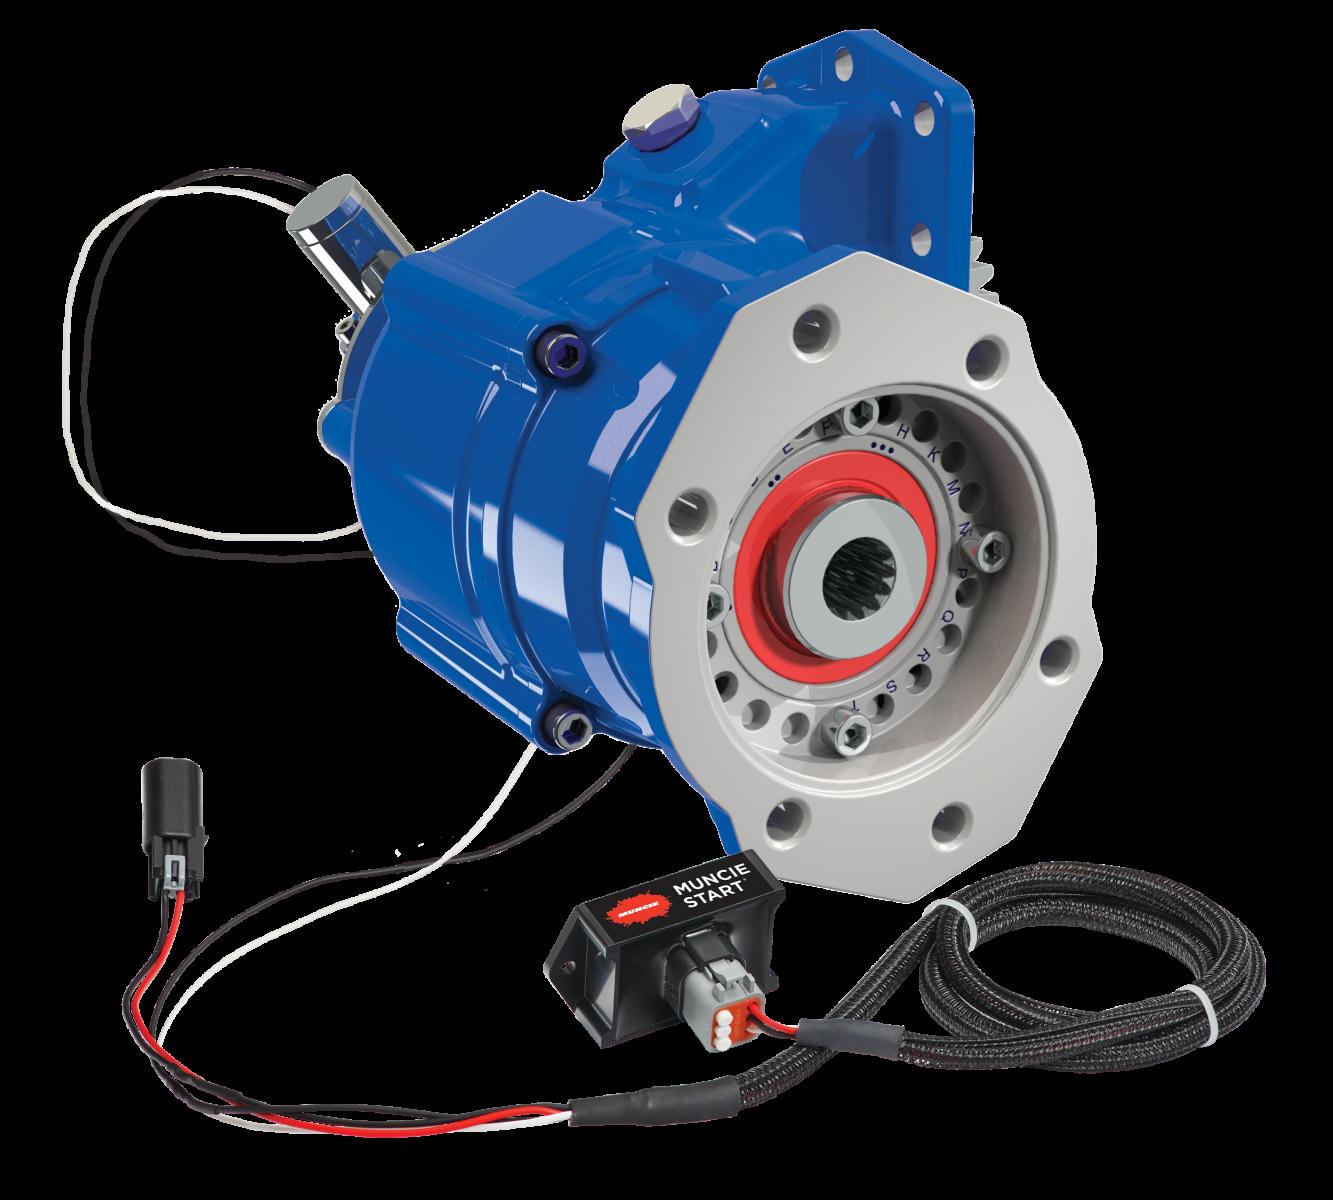 Muncie Power A20 Series PTO with Muncie Start